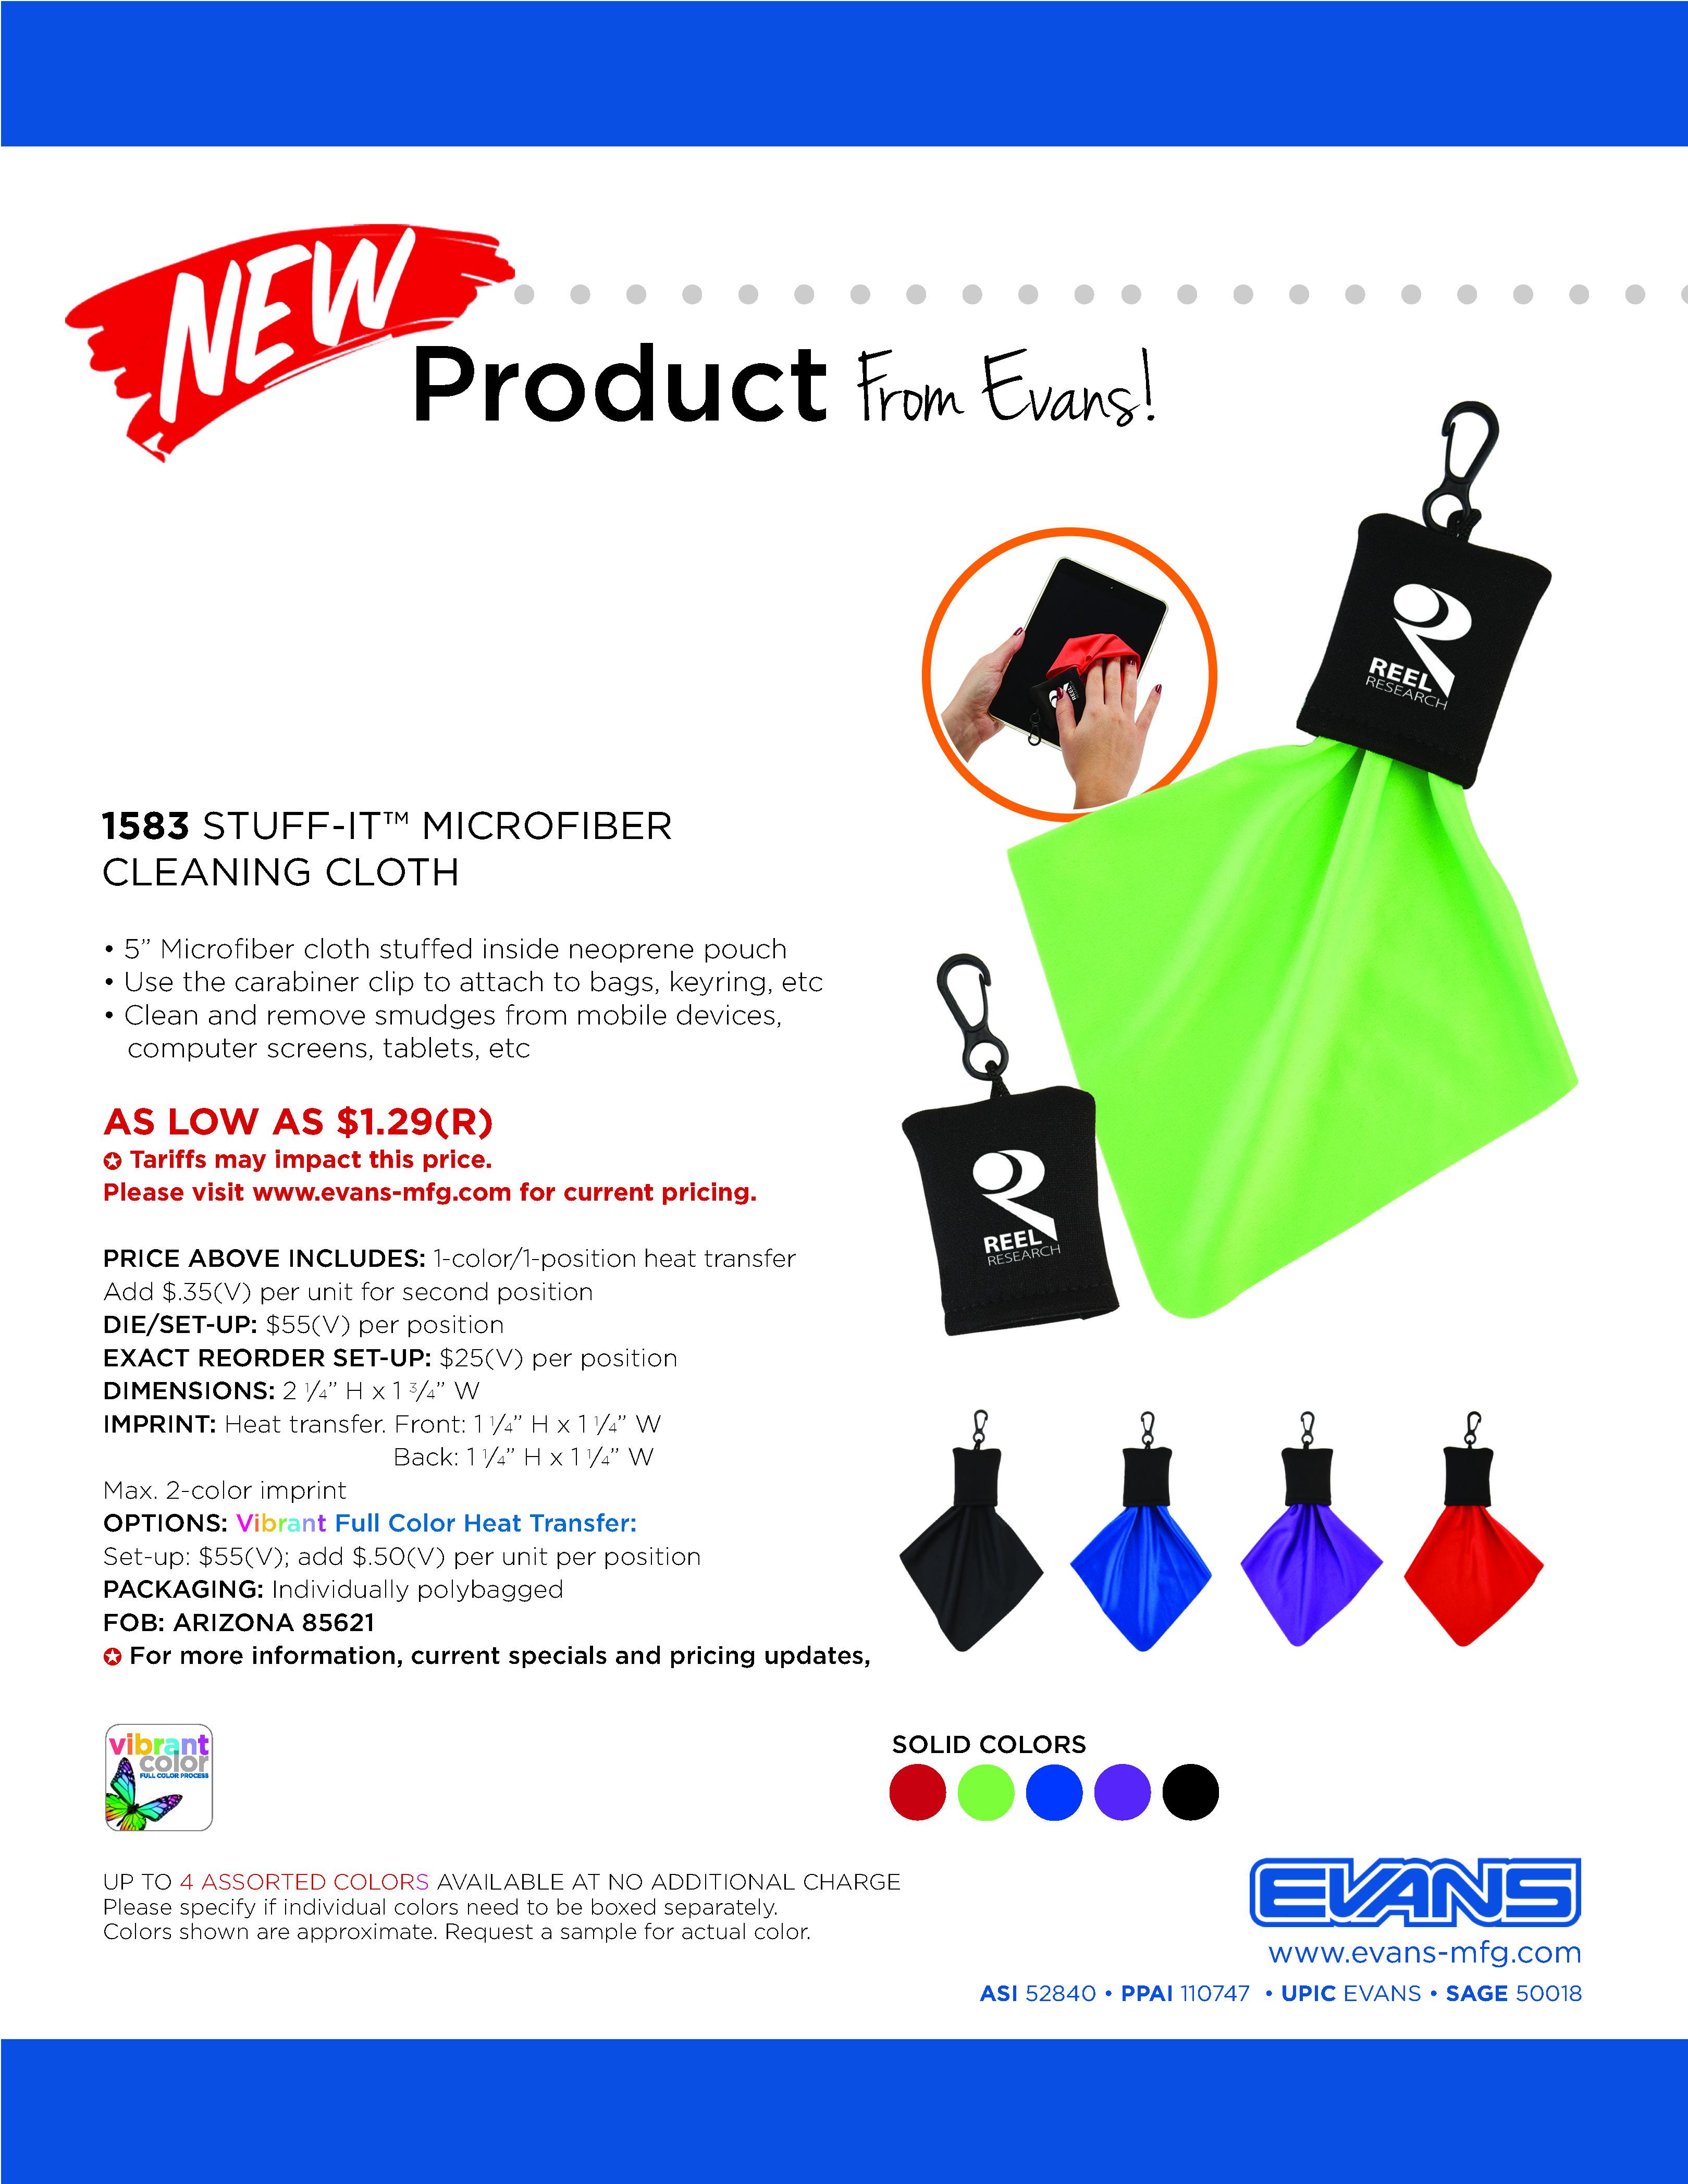 1583 Stuff-It™ Microfiber Cleaning Cloth